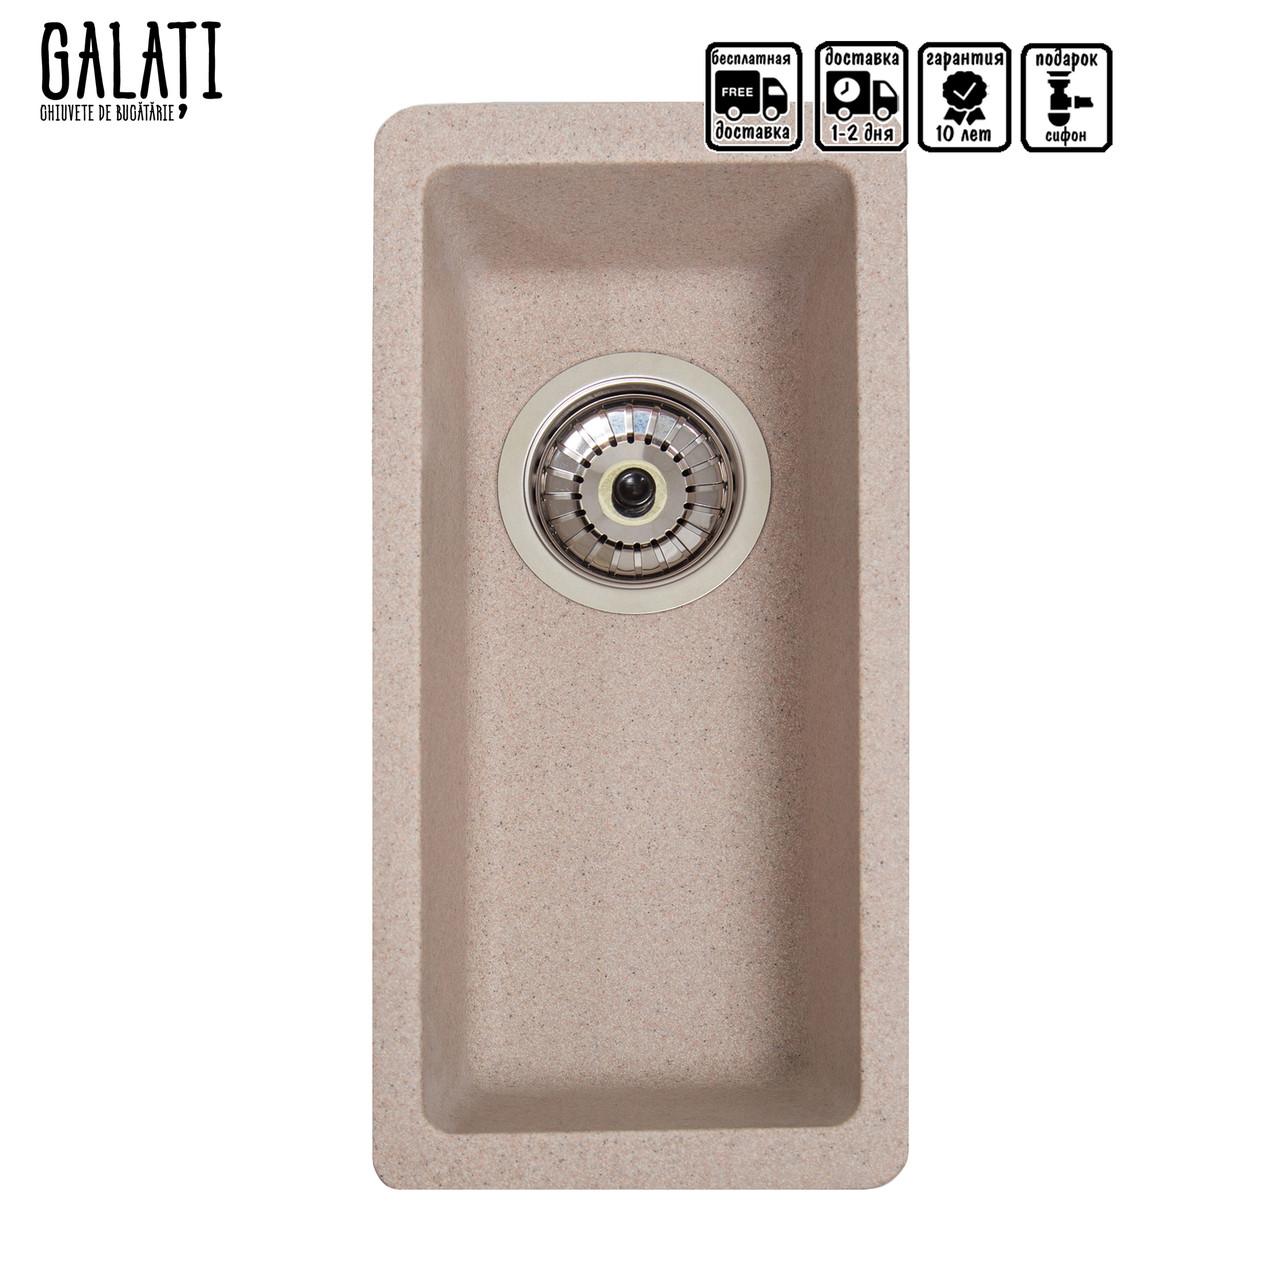 Кухонна мийка Galati Mira U-160 Bezhvy (401)